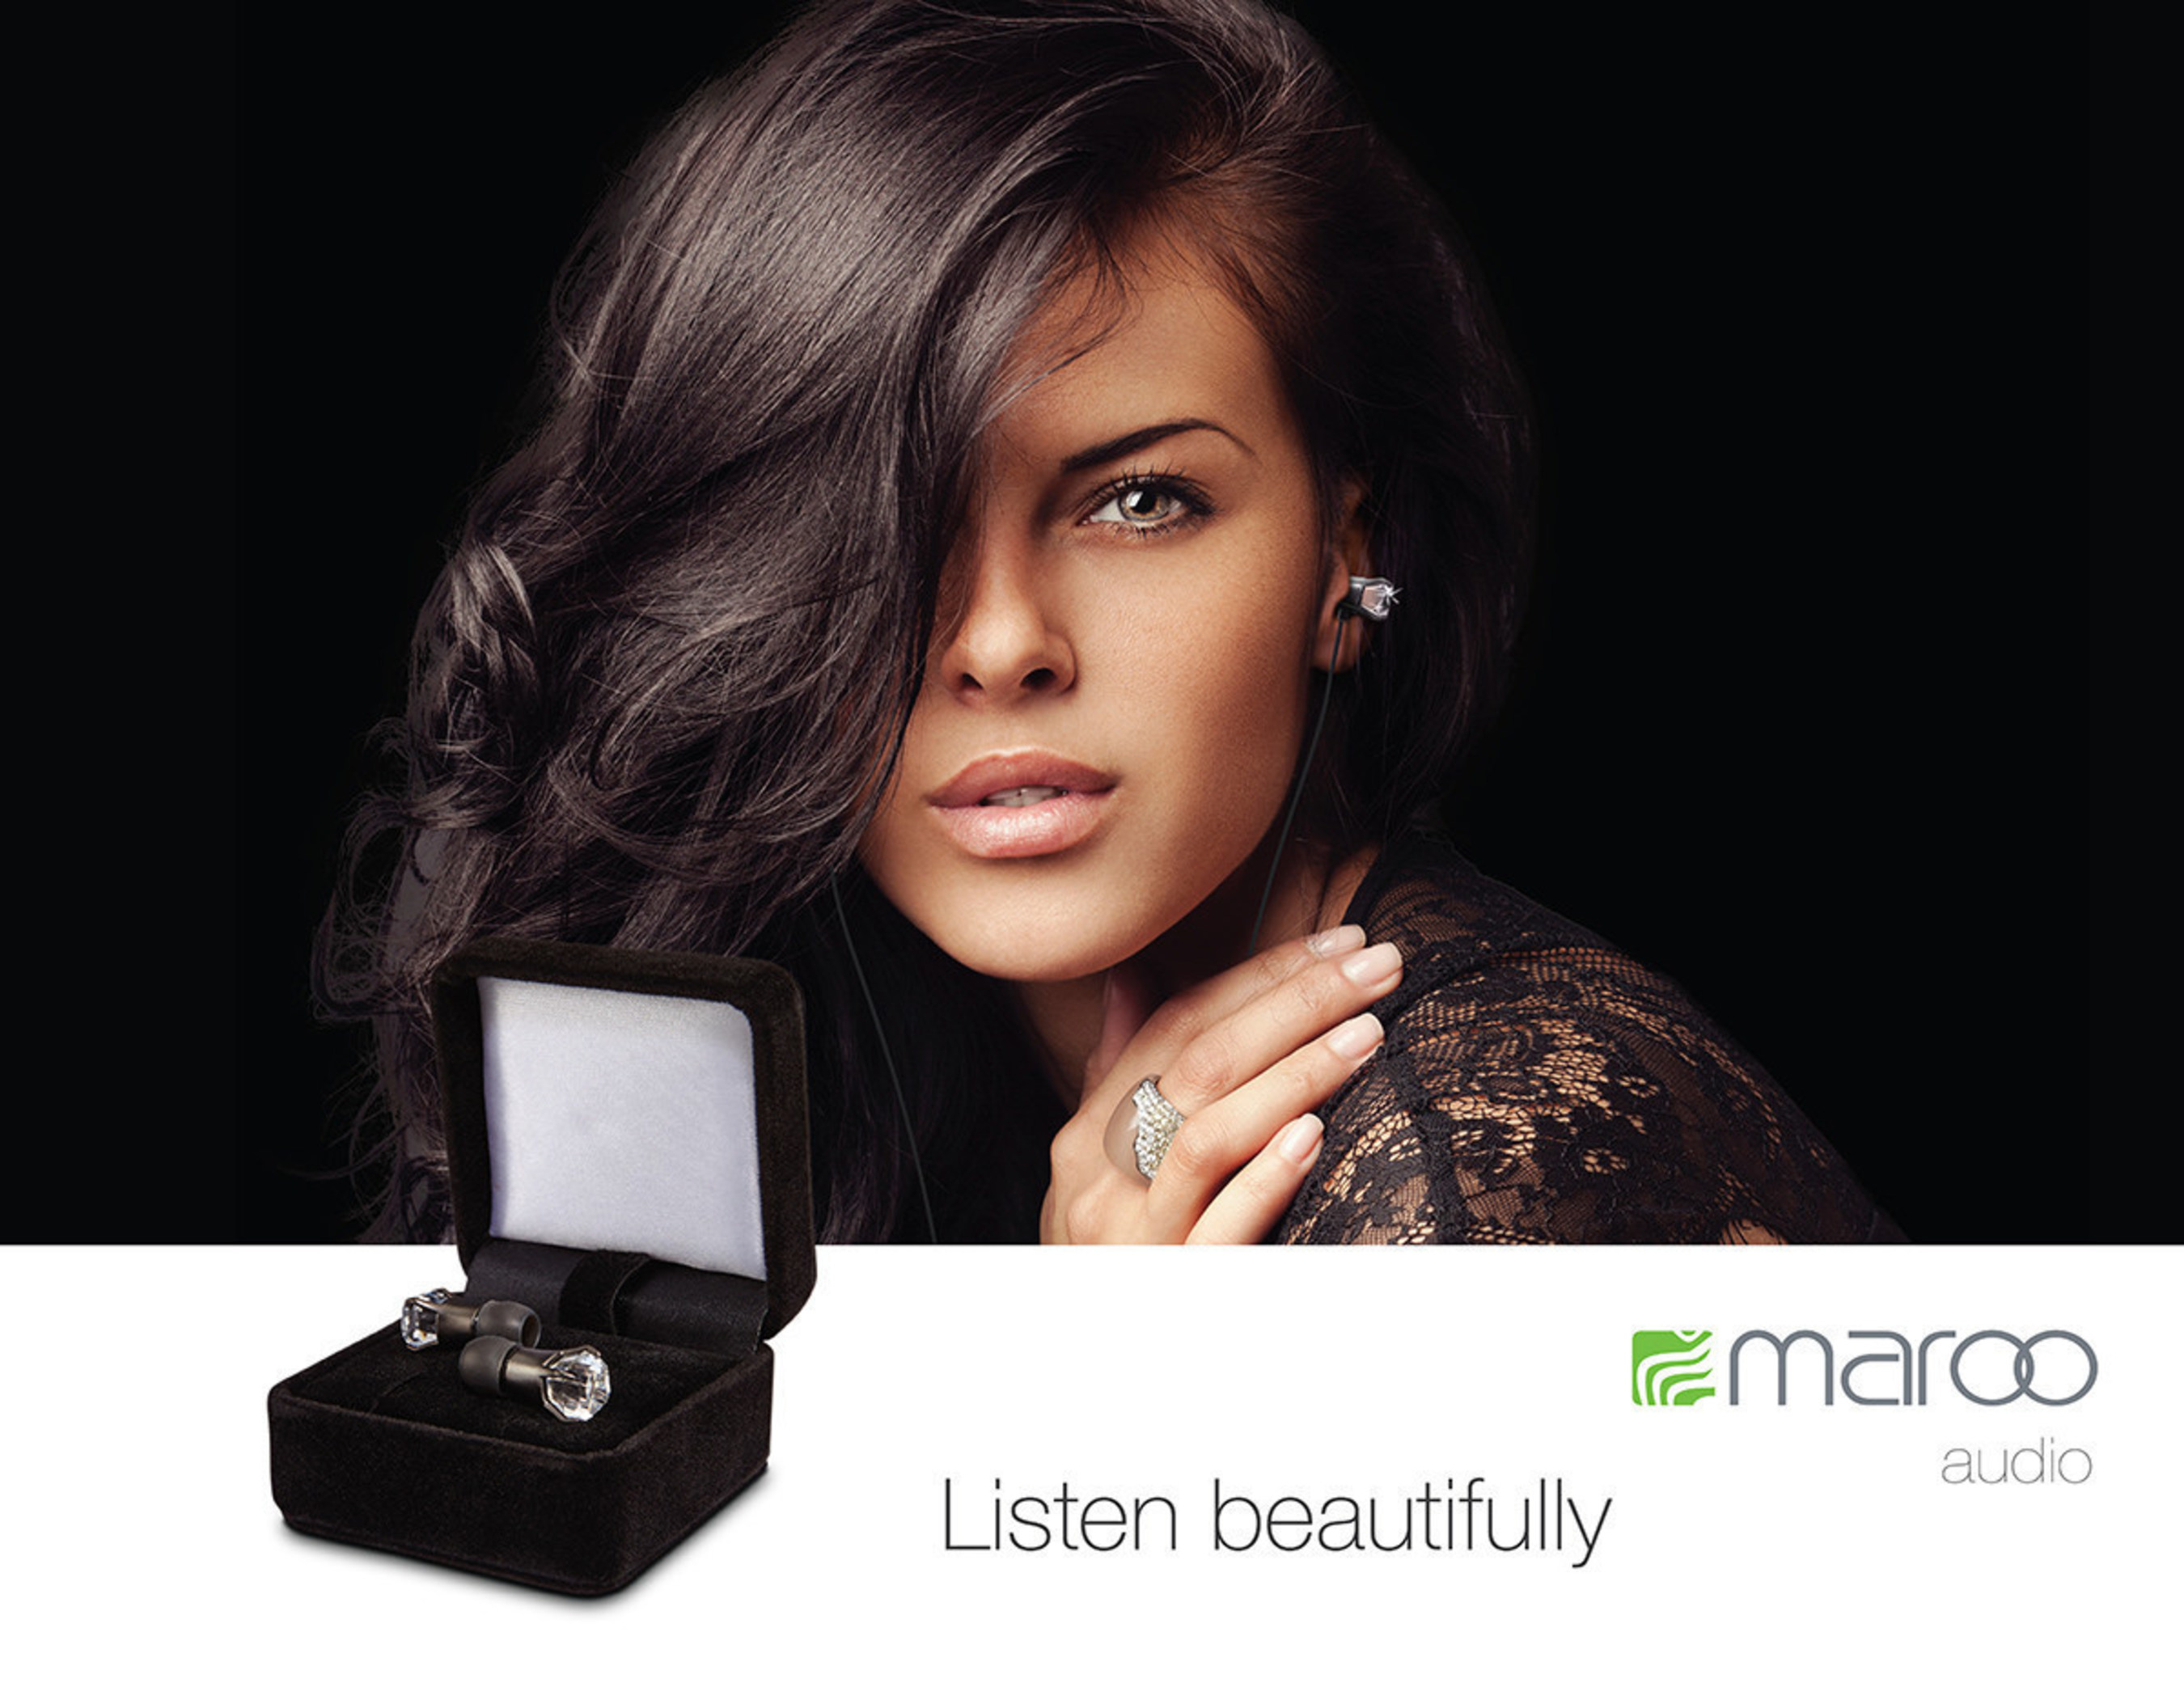 Maroo Audio GEM Collection - Listen Beautifully!